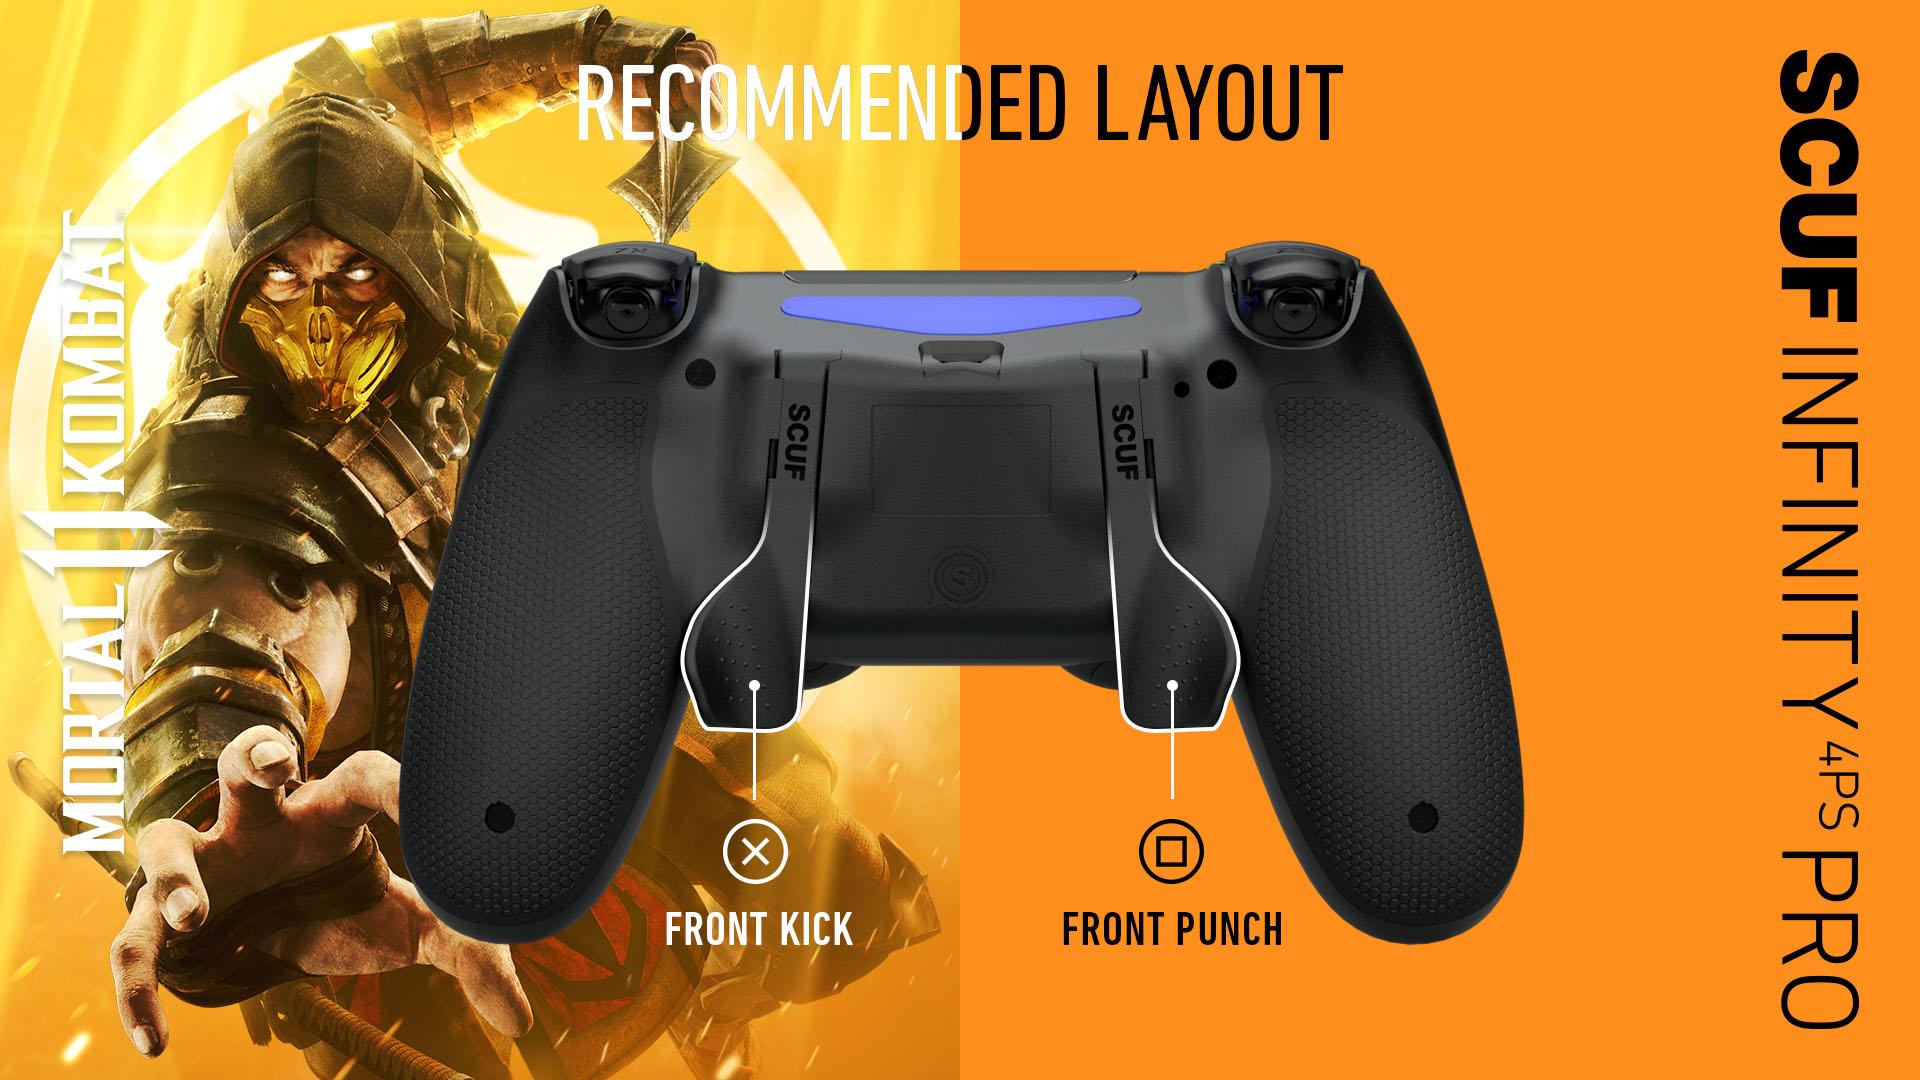 Mortal Kombat 11 Playstation Layout SCUF INFINITY4PSPRO